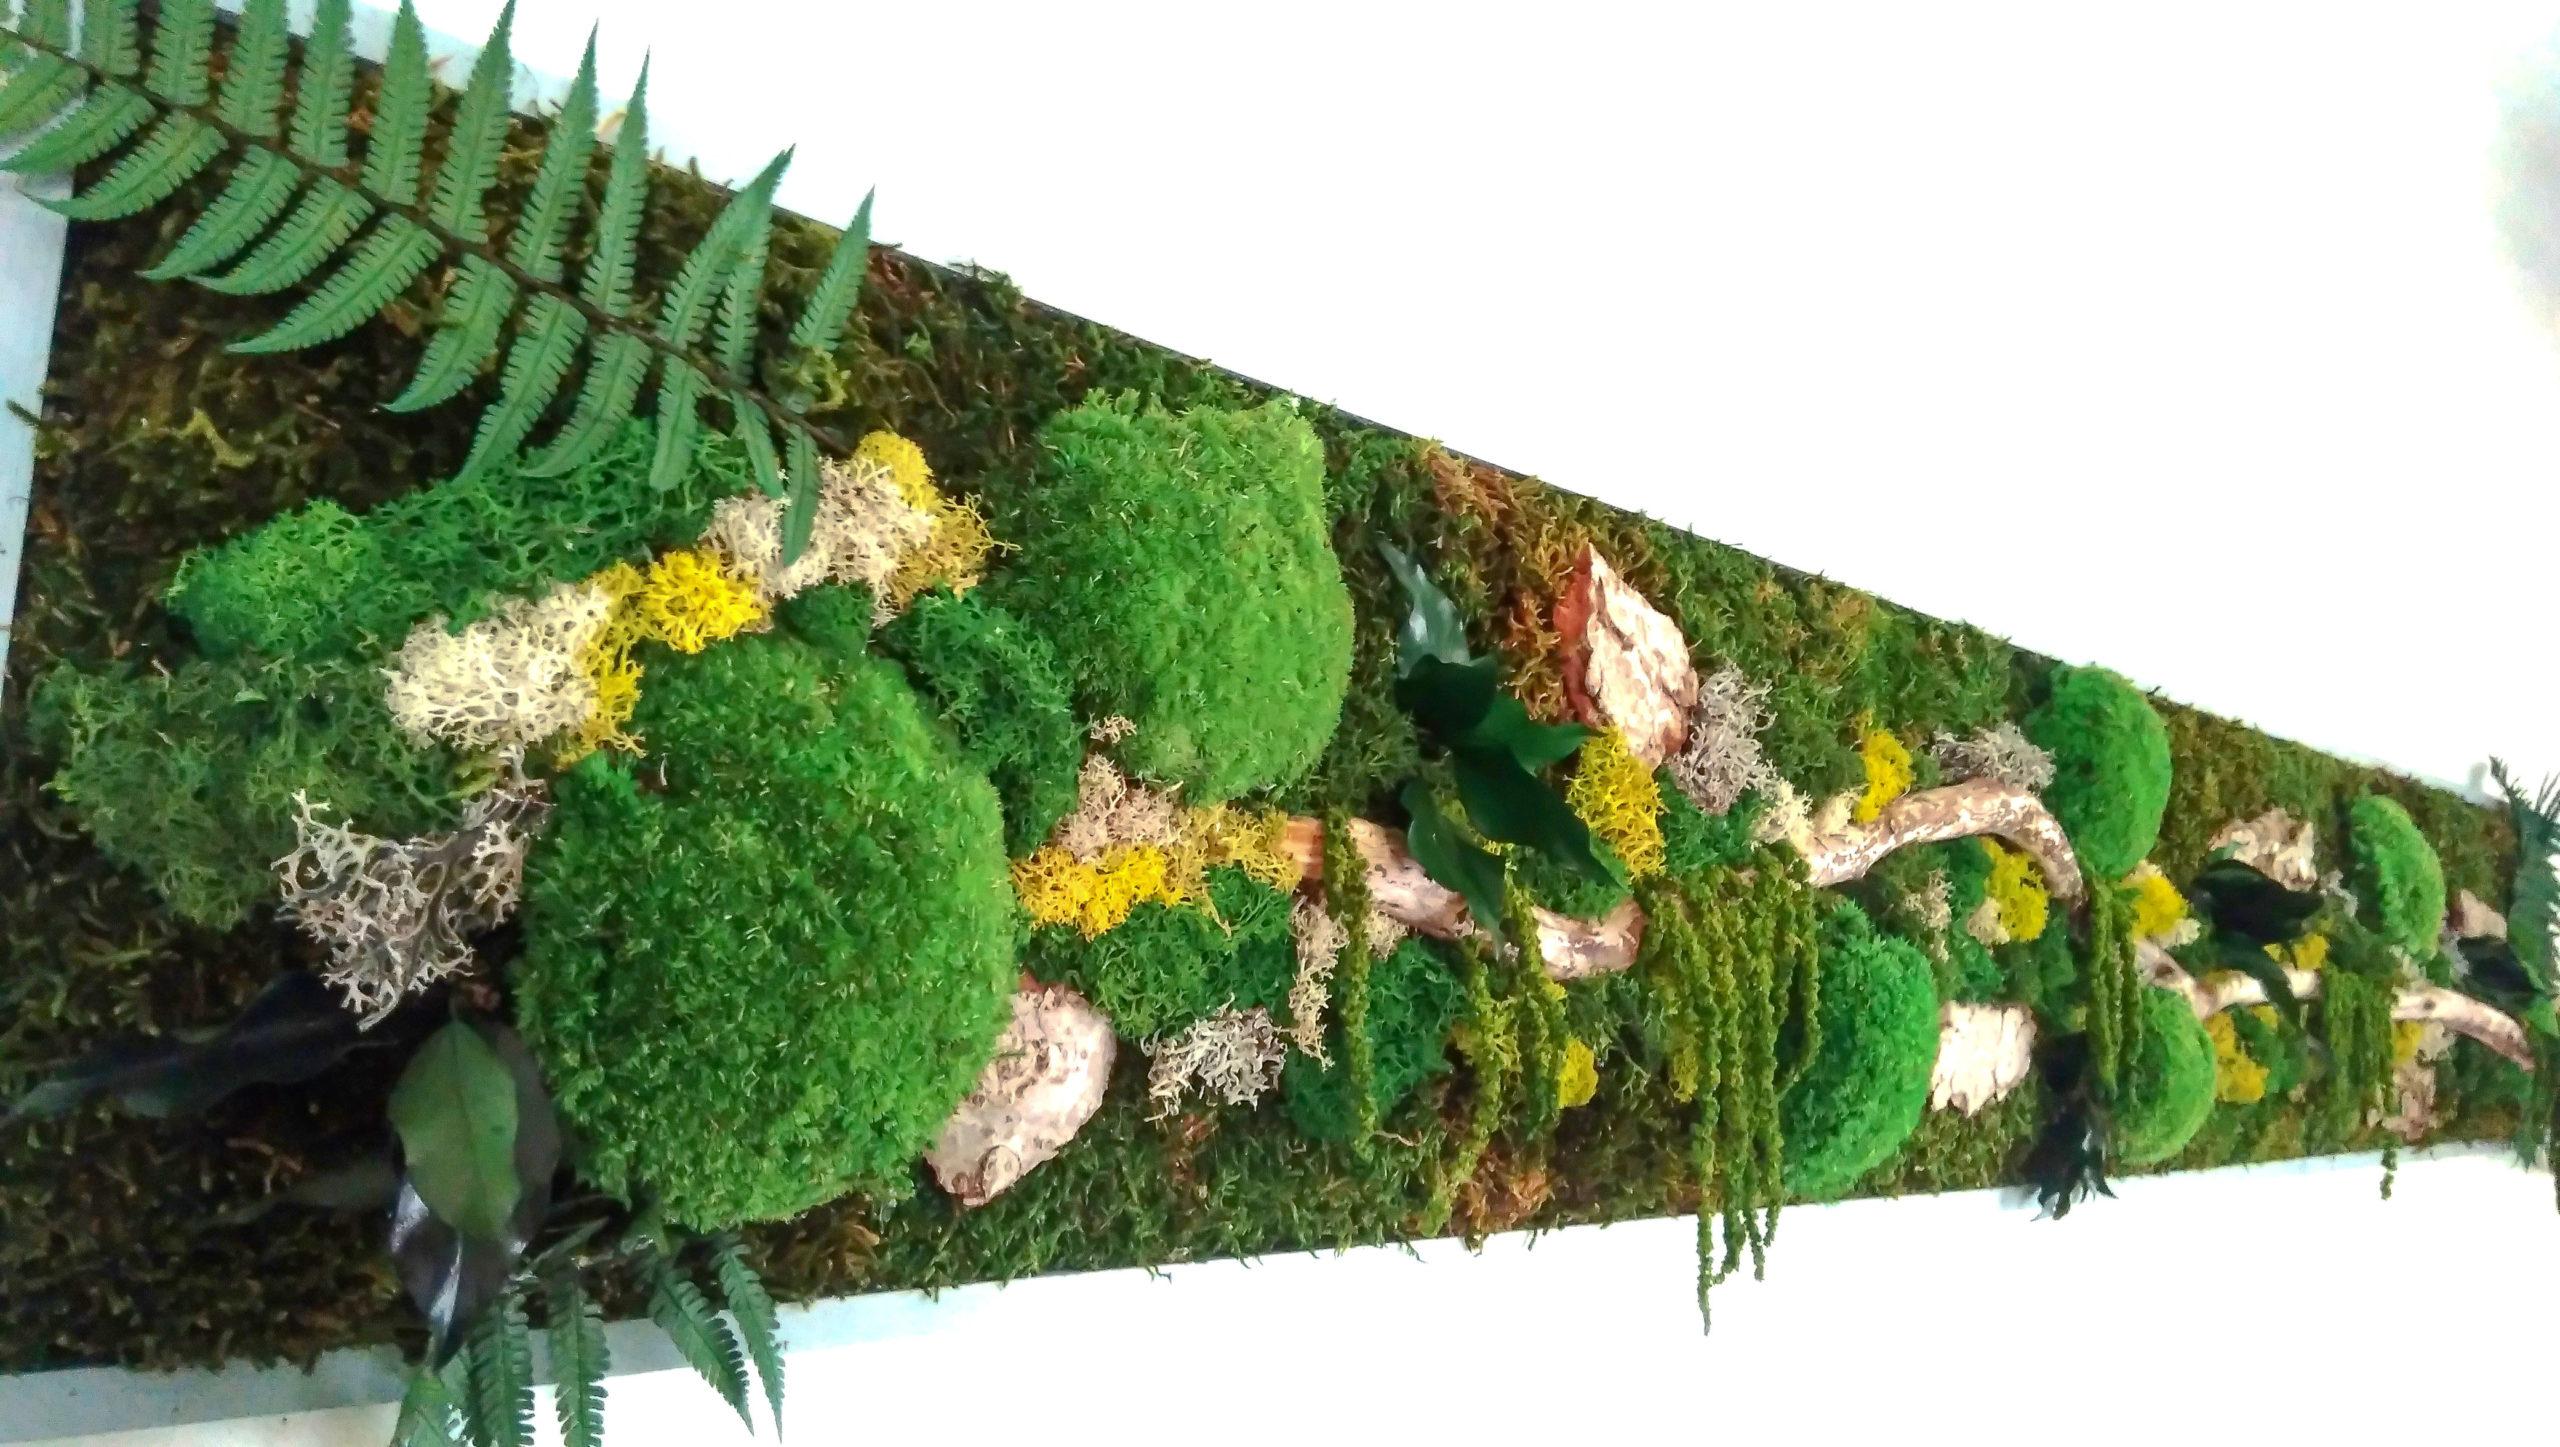 Tableau végétal